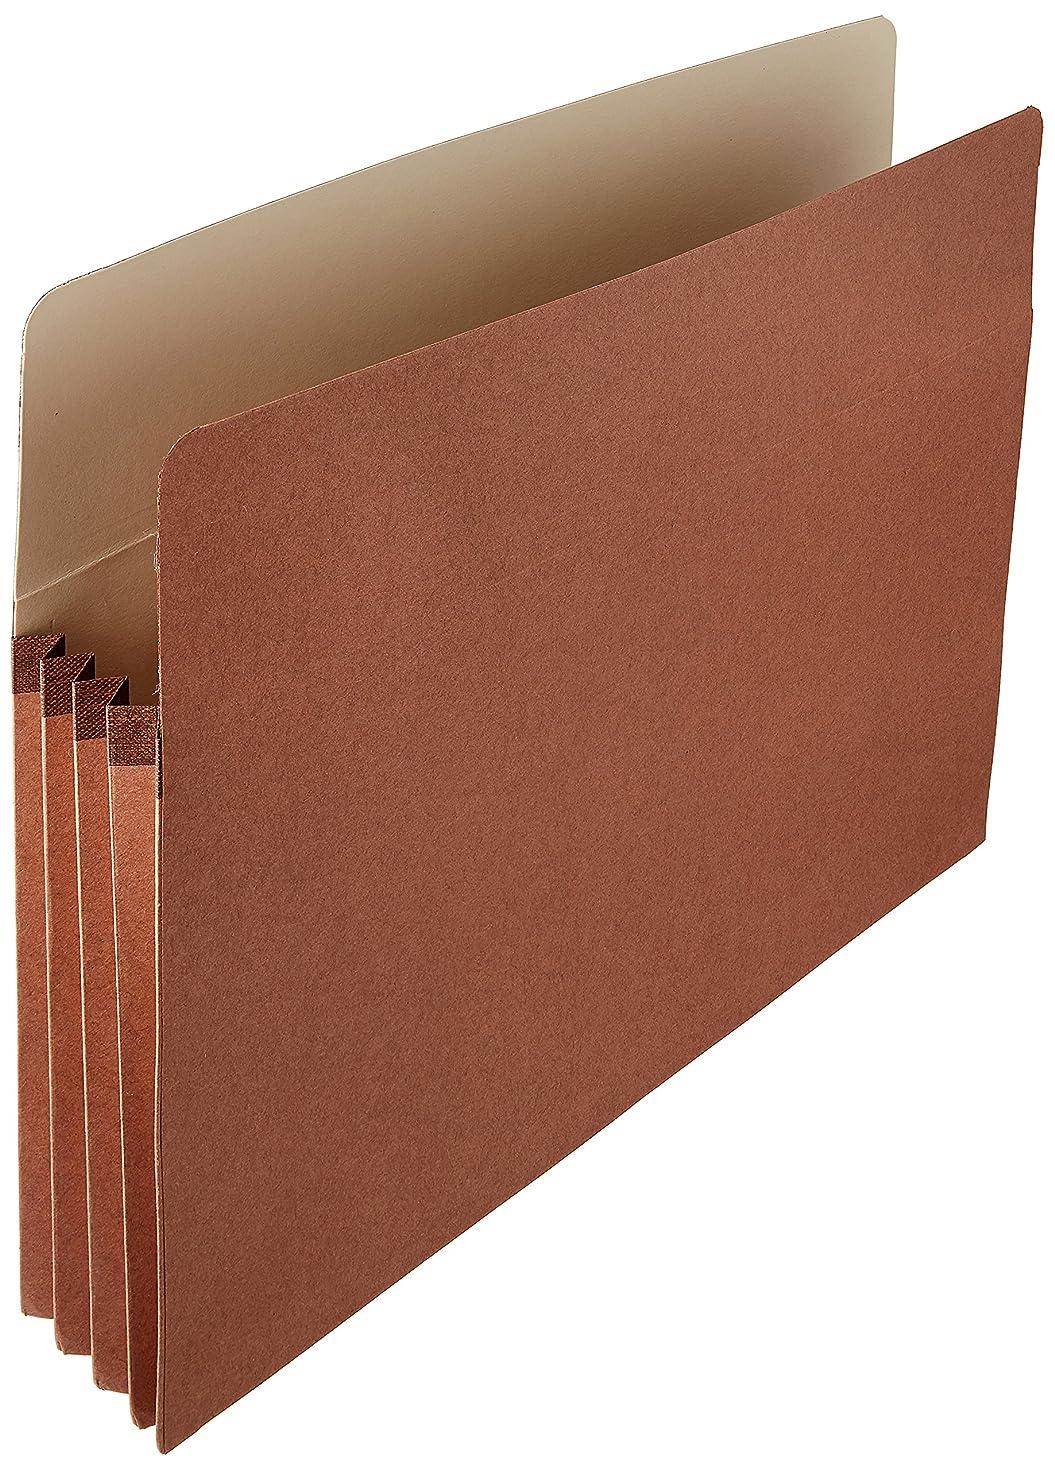 AmazonBasics Expanding Accordian Organizer File Folders - Letter Size, 25-Pack - AMZ300